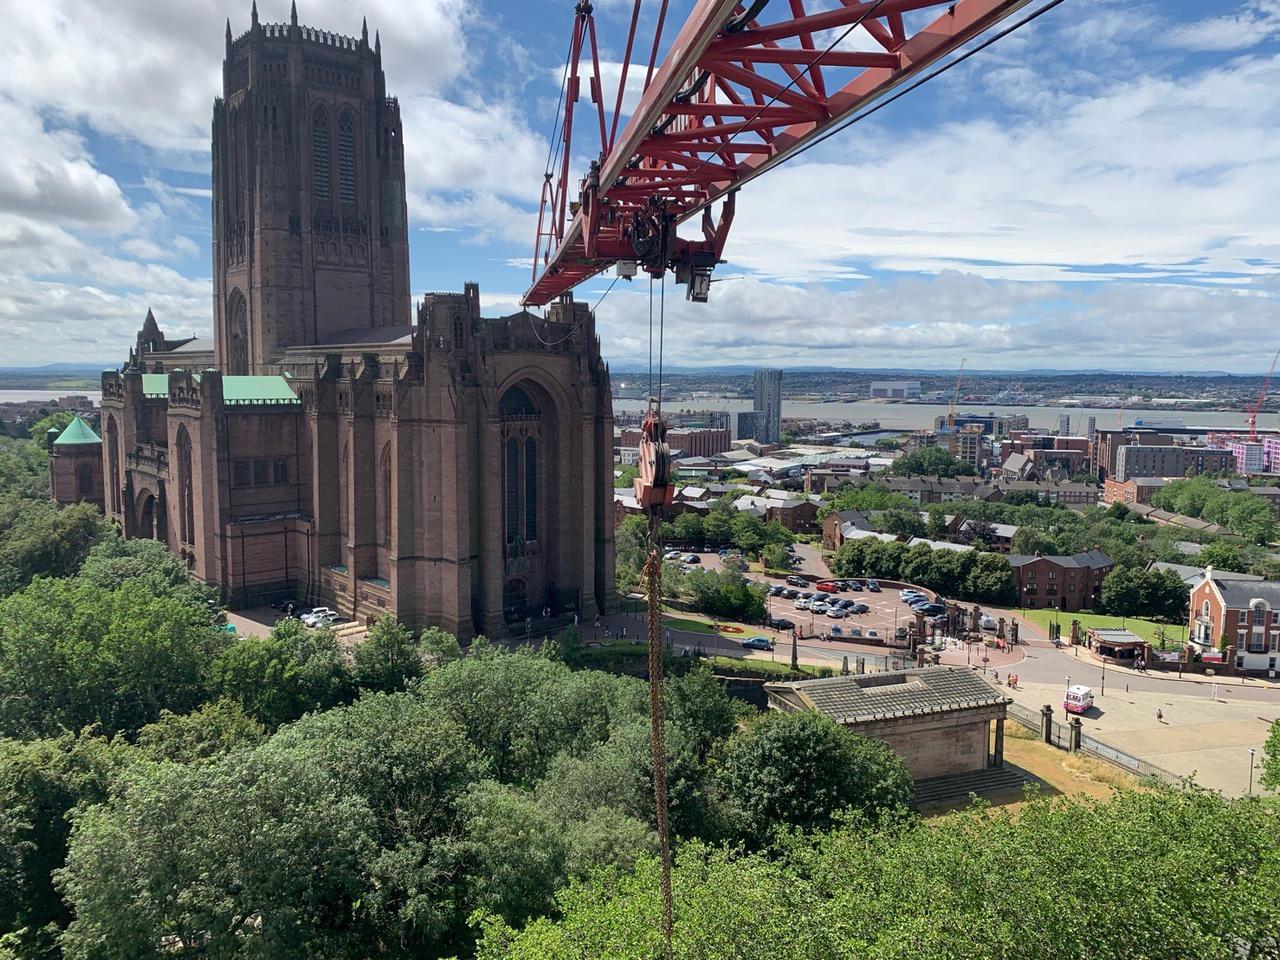 Crane Hire Liverpool